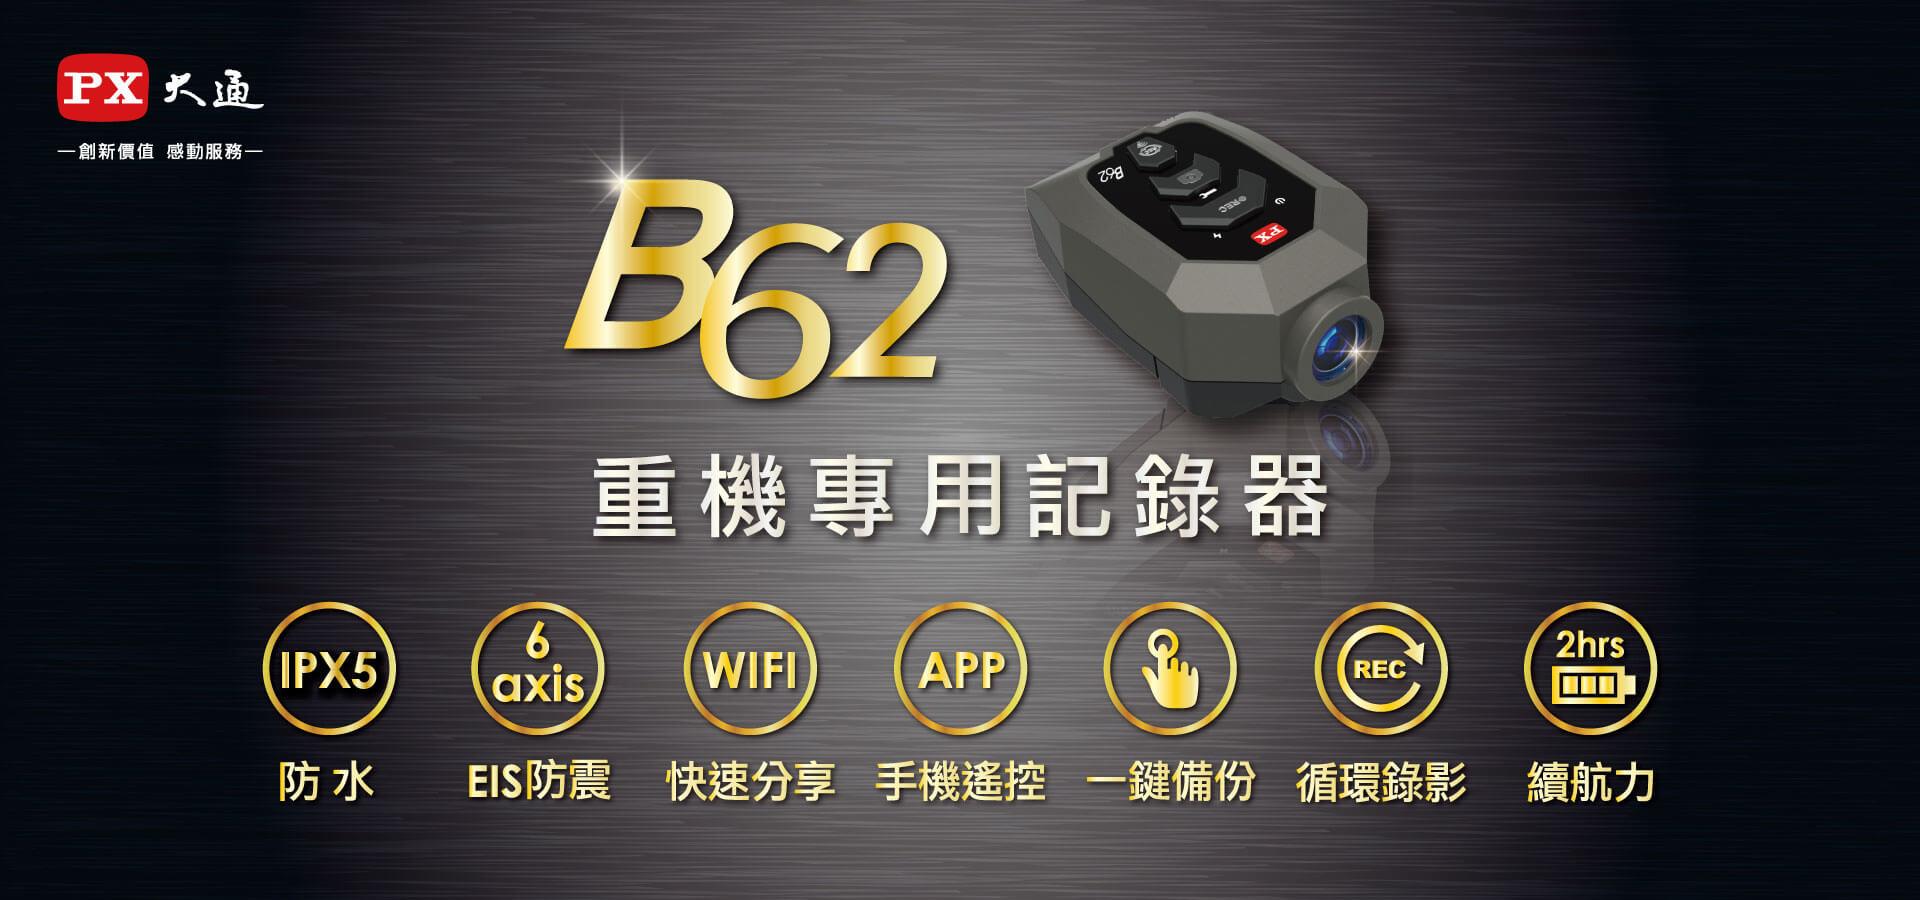 proimages/product/pro-01/pro-01-002/B62/B62-03.jpg